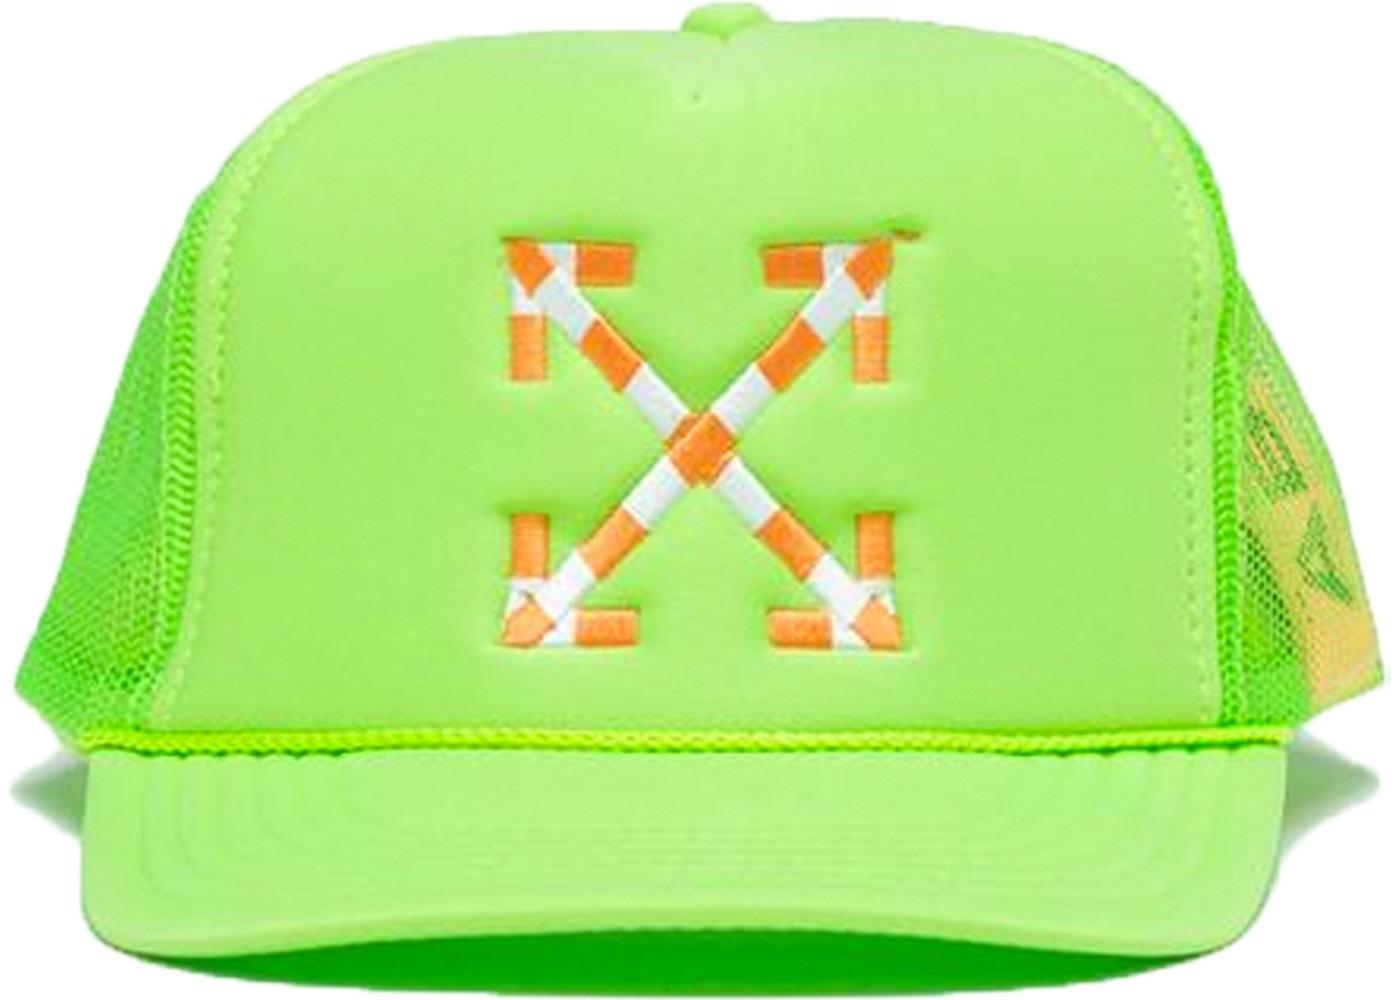 25555ed4aee Virgil Abloh x MCA Figures of Speech Trucker Hat Green - SS19